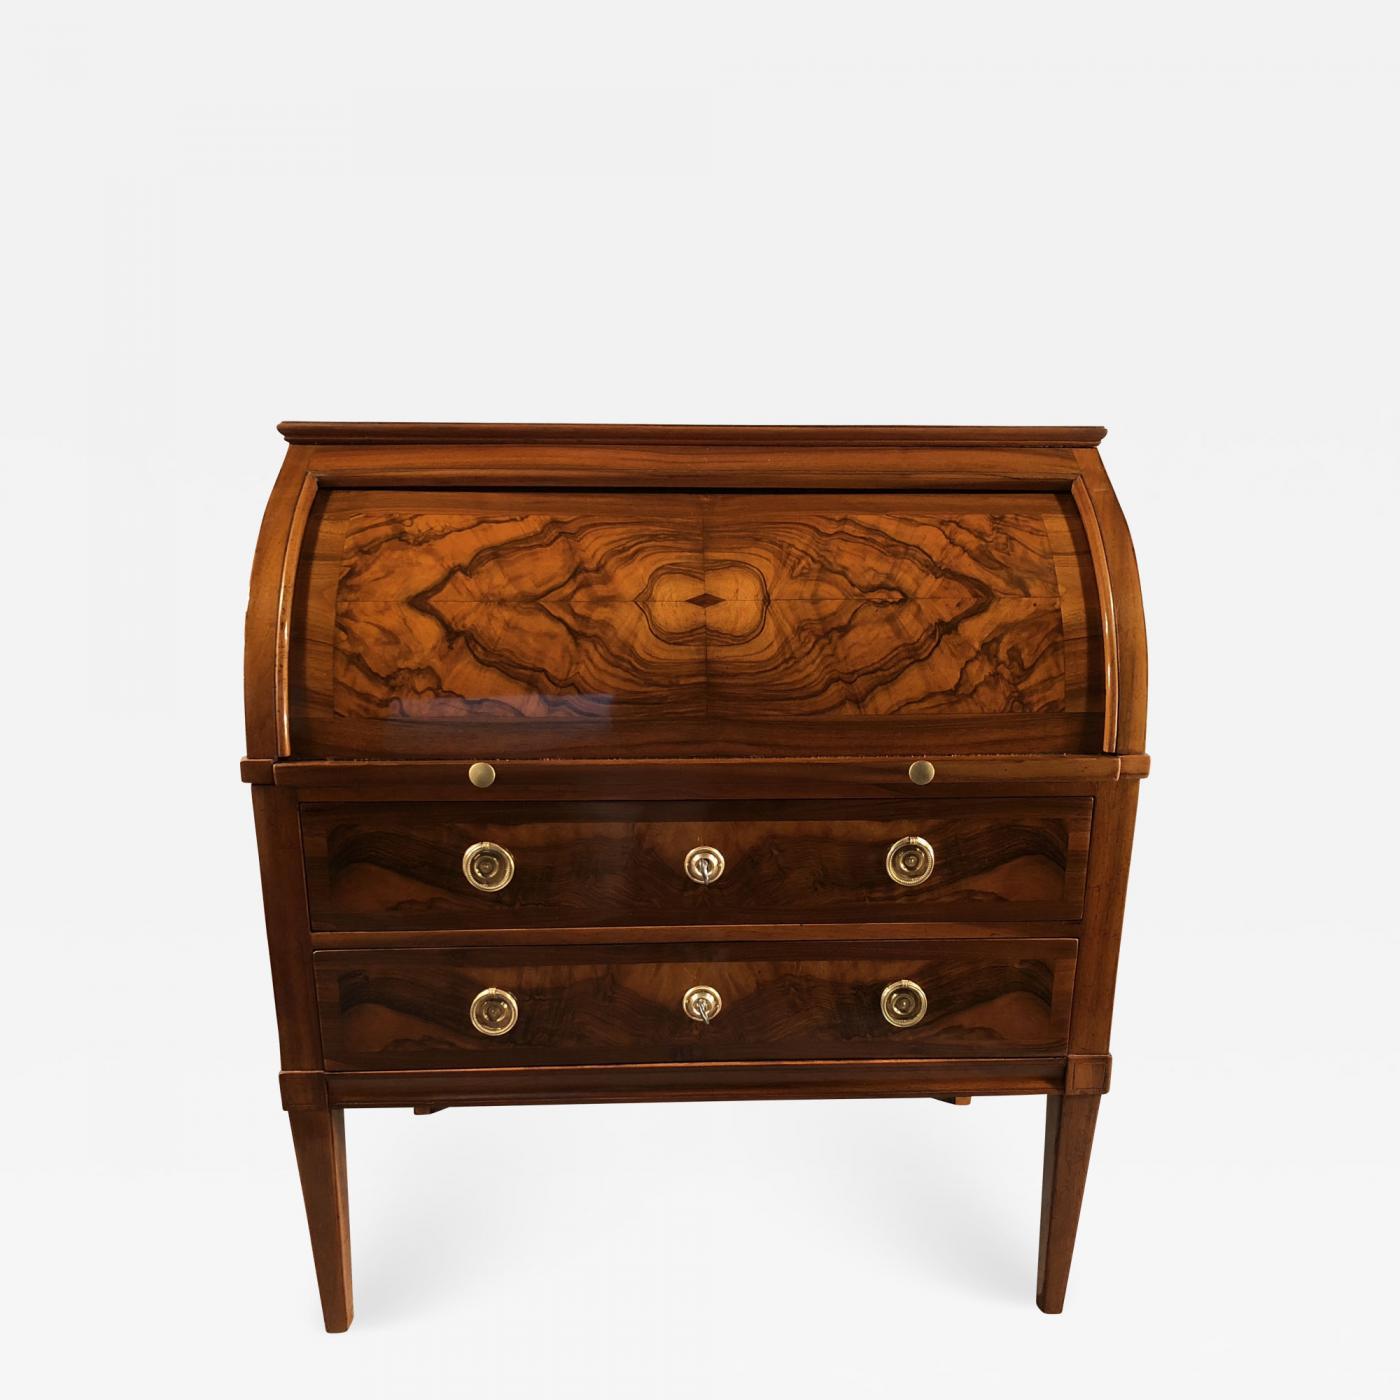 8da1248df4e6a Louis XVI Rolltop Desk South Germany 1780. Tap to expand